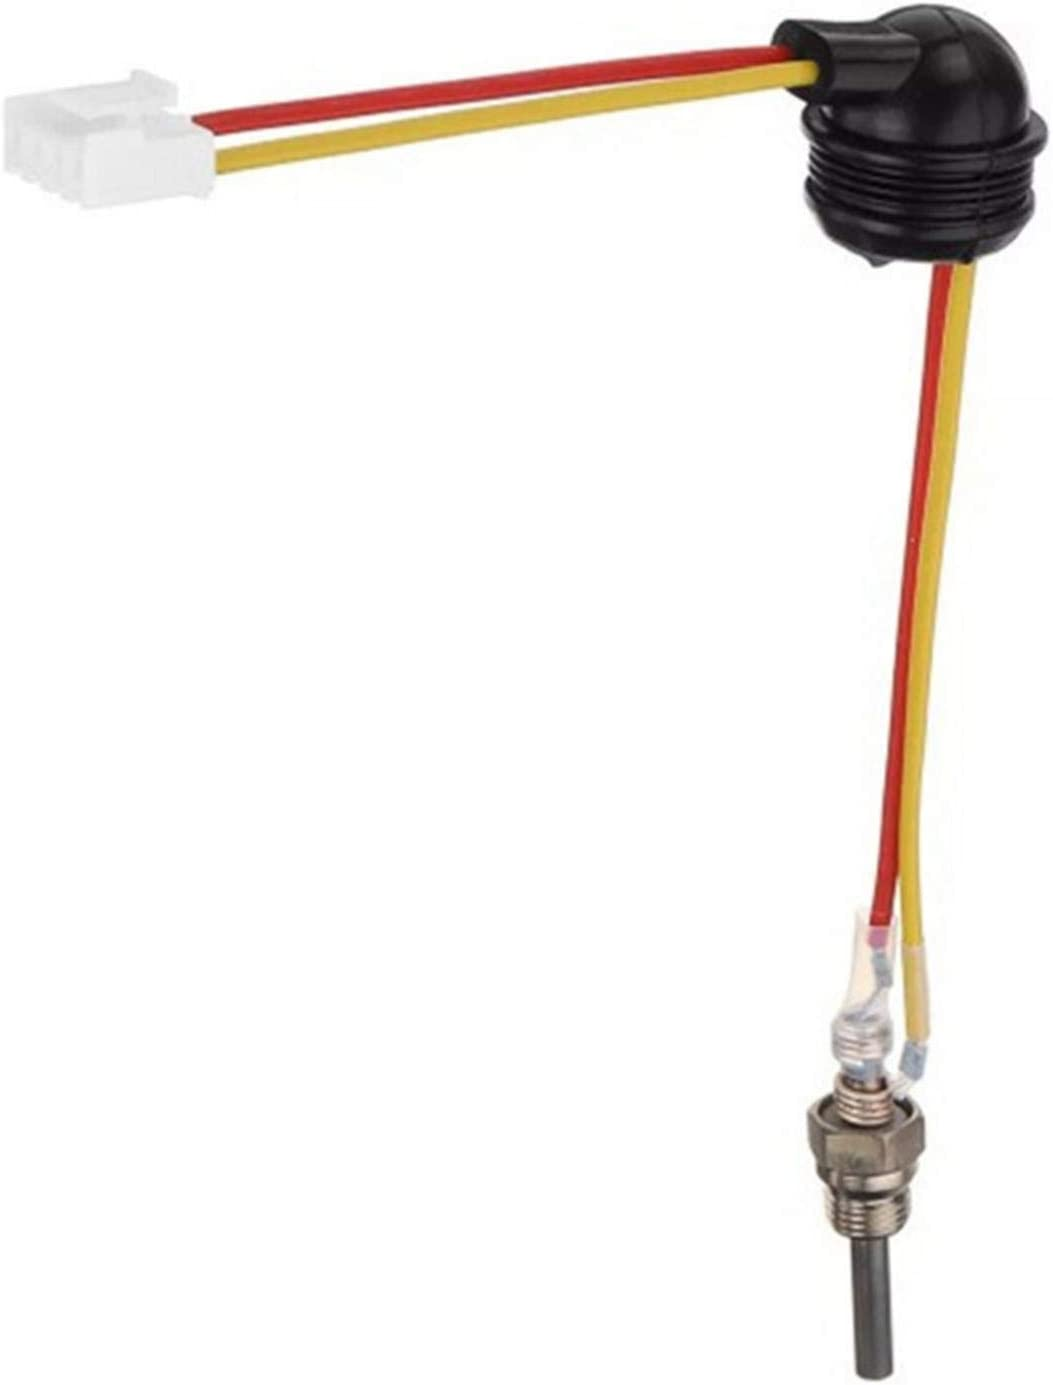 advancethy 12V24V Car Truck Parking Heater Ignition Plug Fittings 88-98W Universal Air Diesel Heater Glow Plug Enjoyment